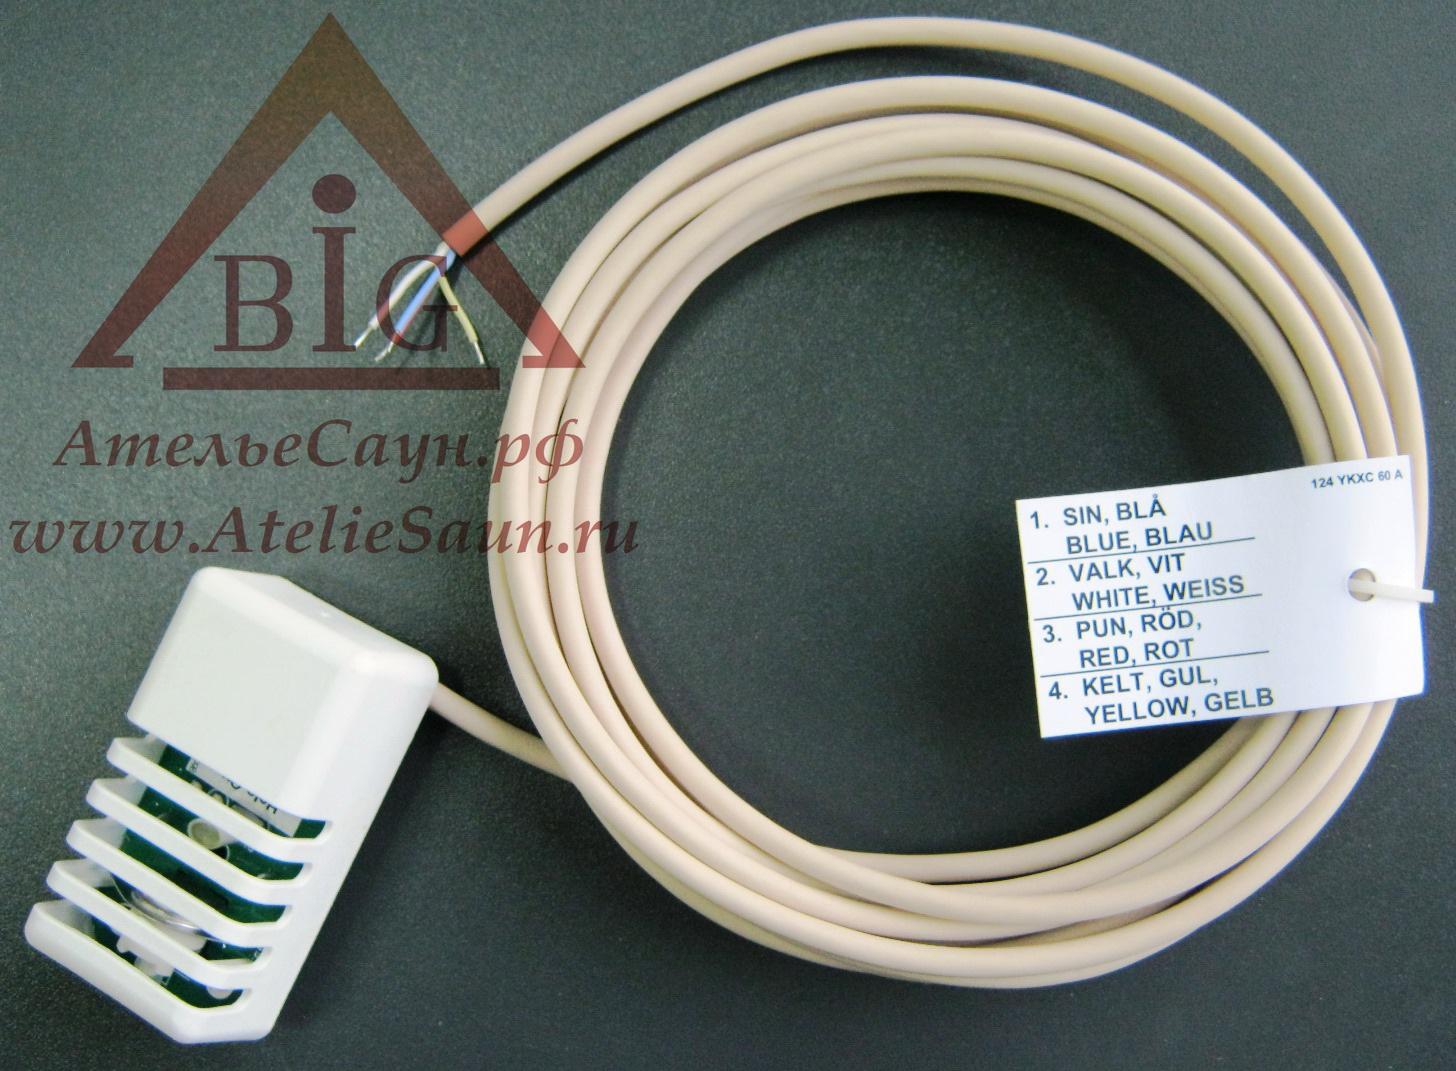 Датчик Helo (для пультов Steamy II, OT 2 PSD, ET 2 PSD, с кабелем 5 м), OLET 6-1